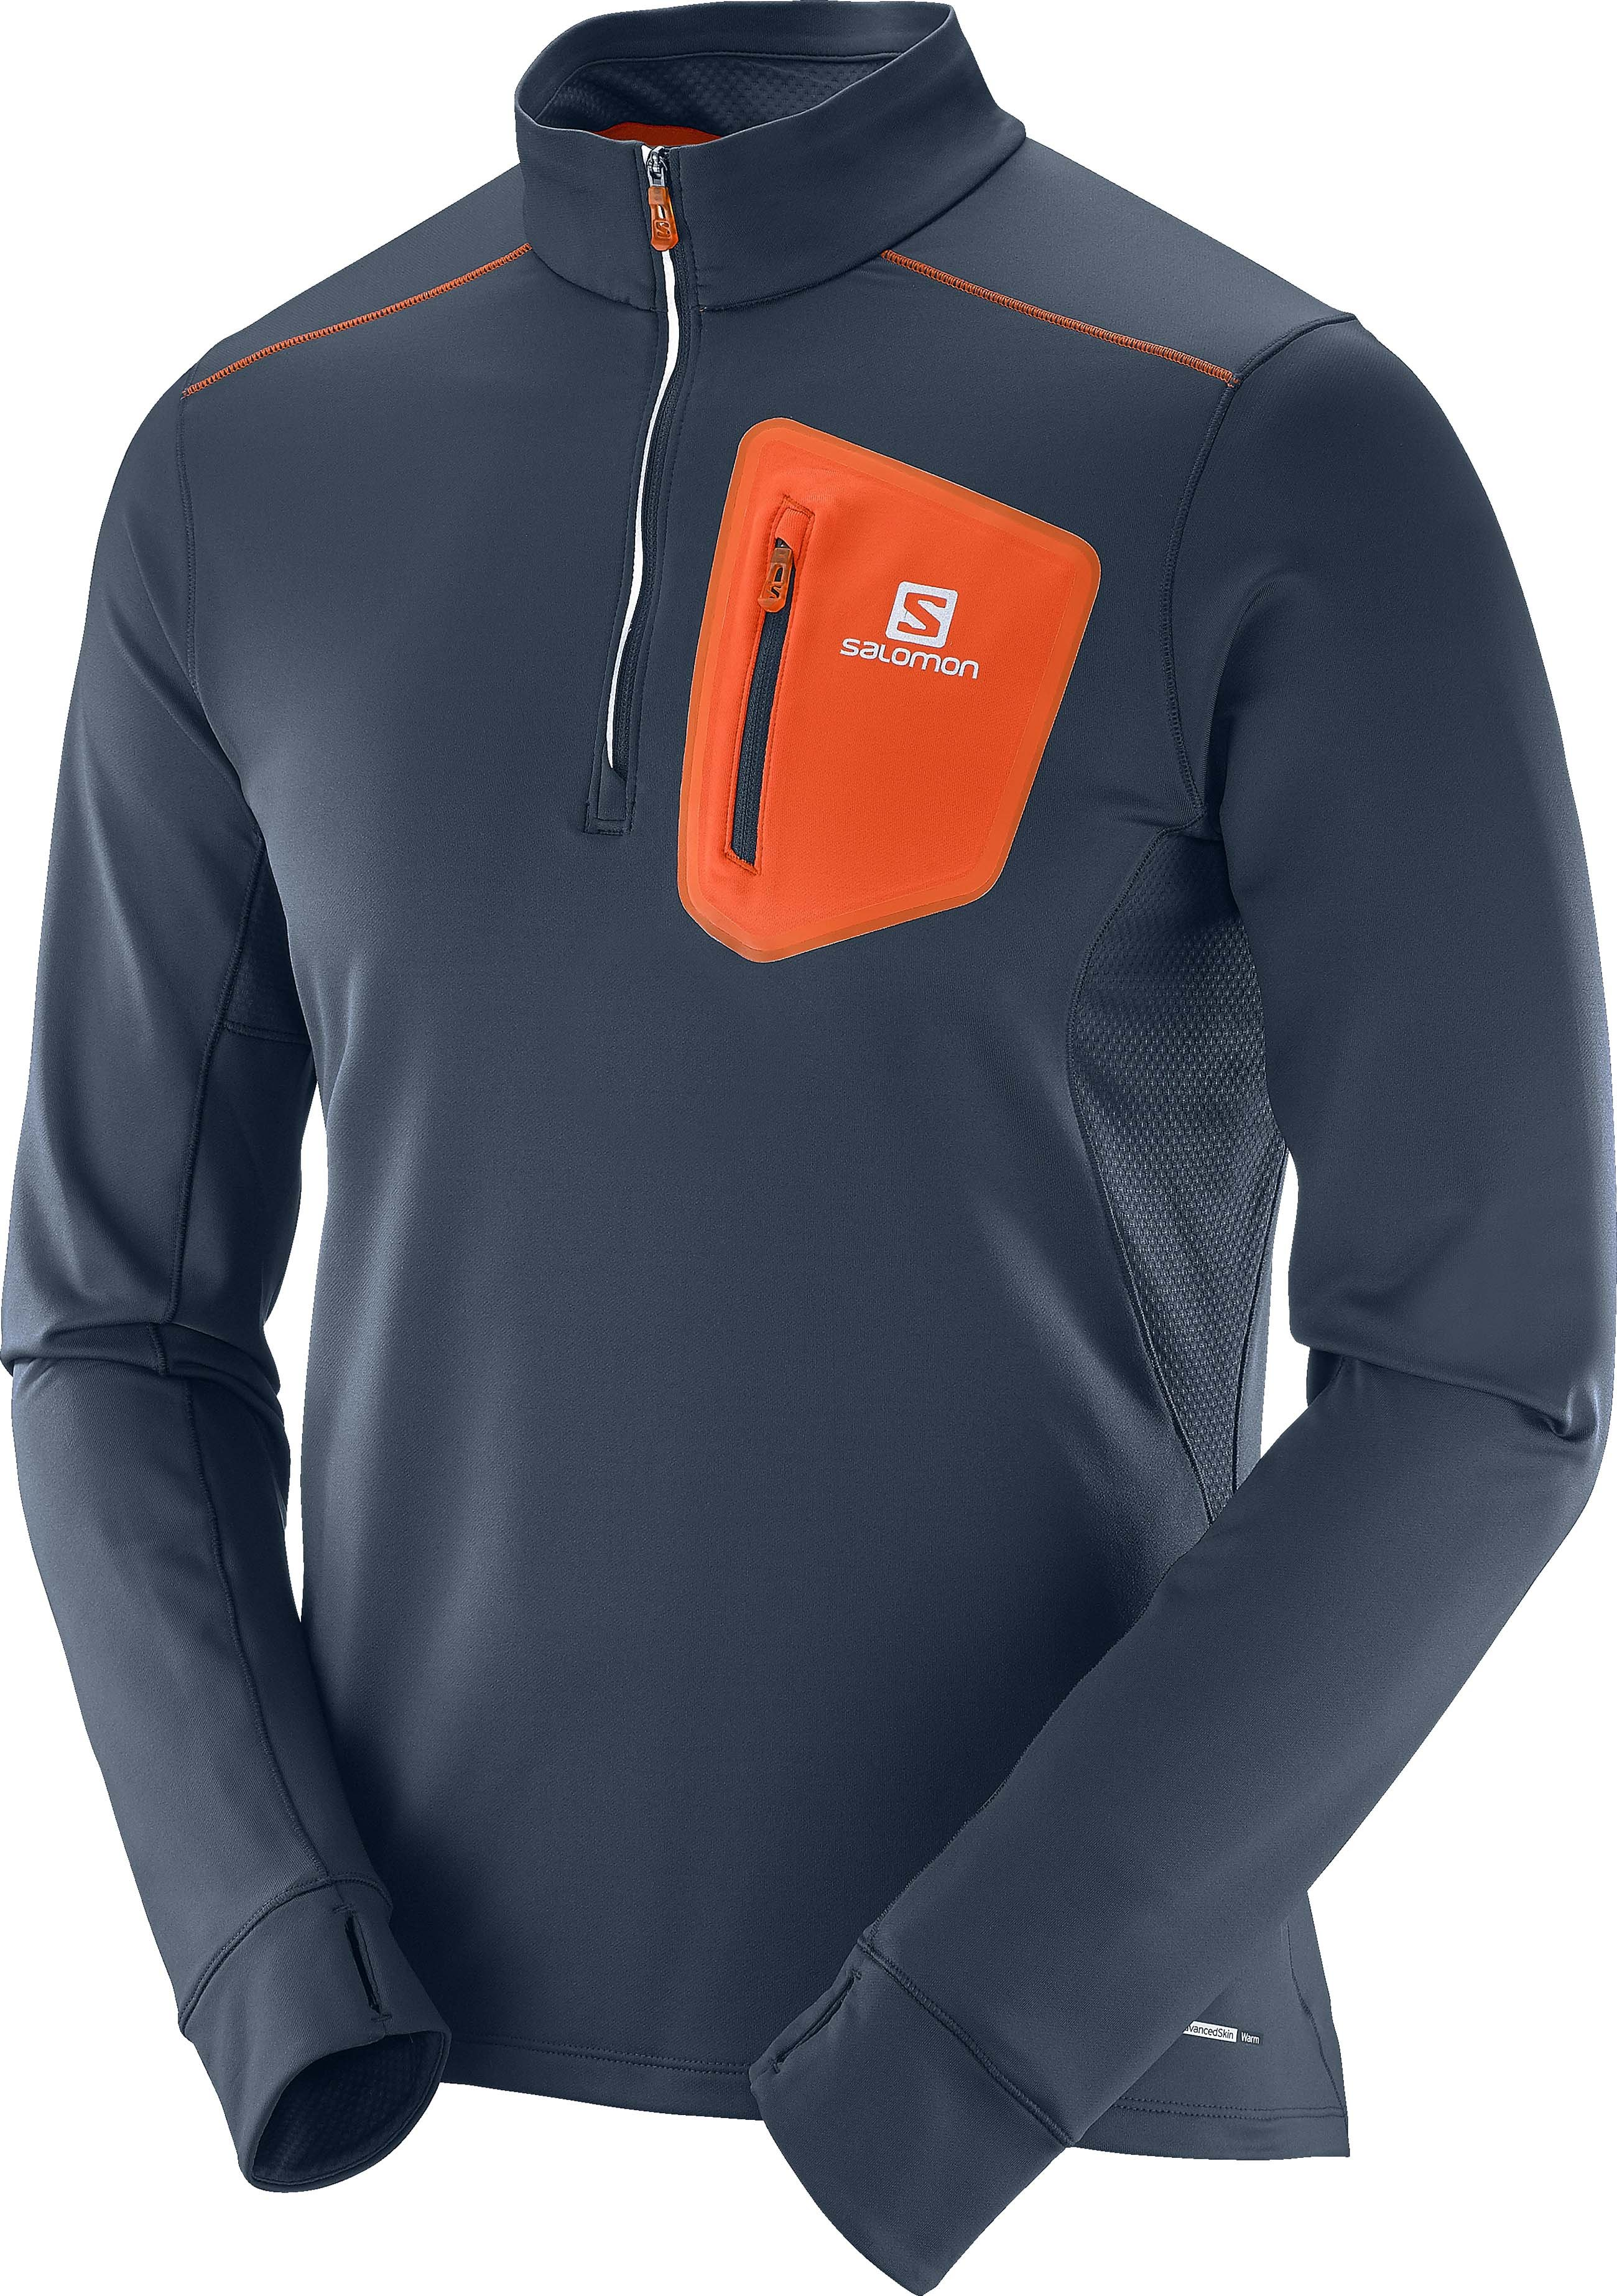 Běžecké triko s dlouhým rukávem Salomon Trail Runner Warm